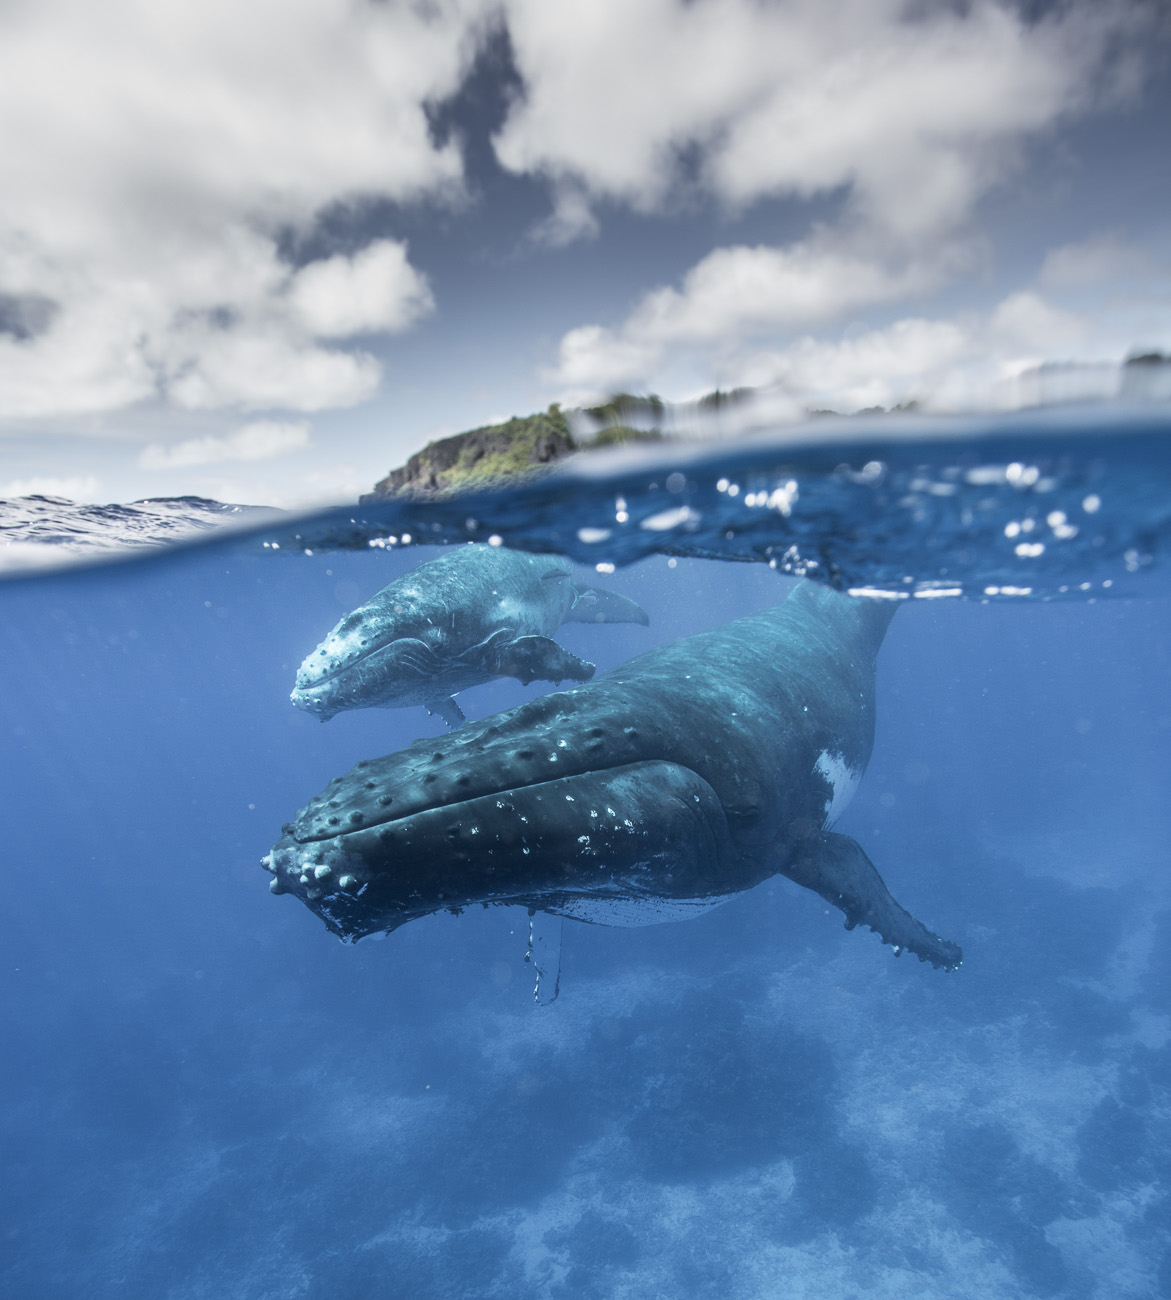 mazille wildlife photo animalière baleine aventure en terre animale 10.jpg